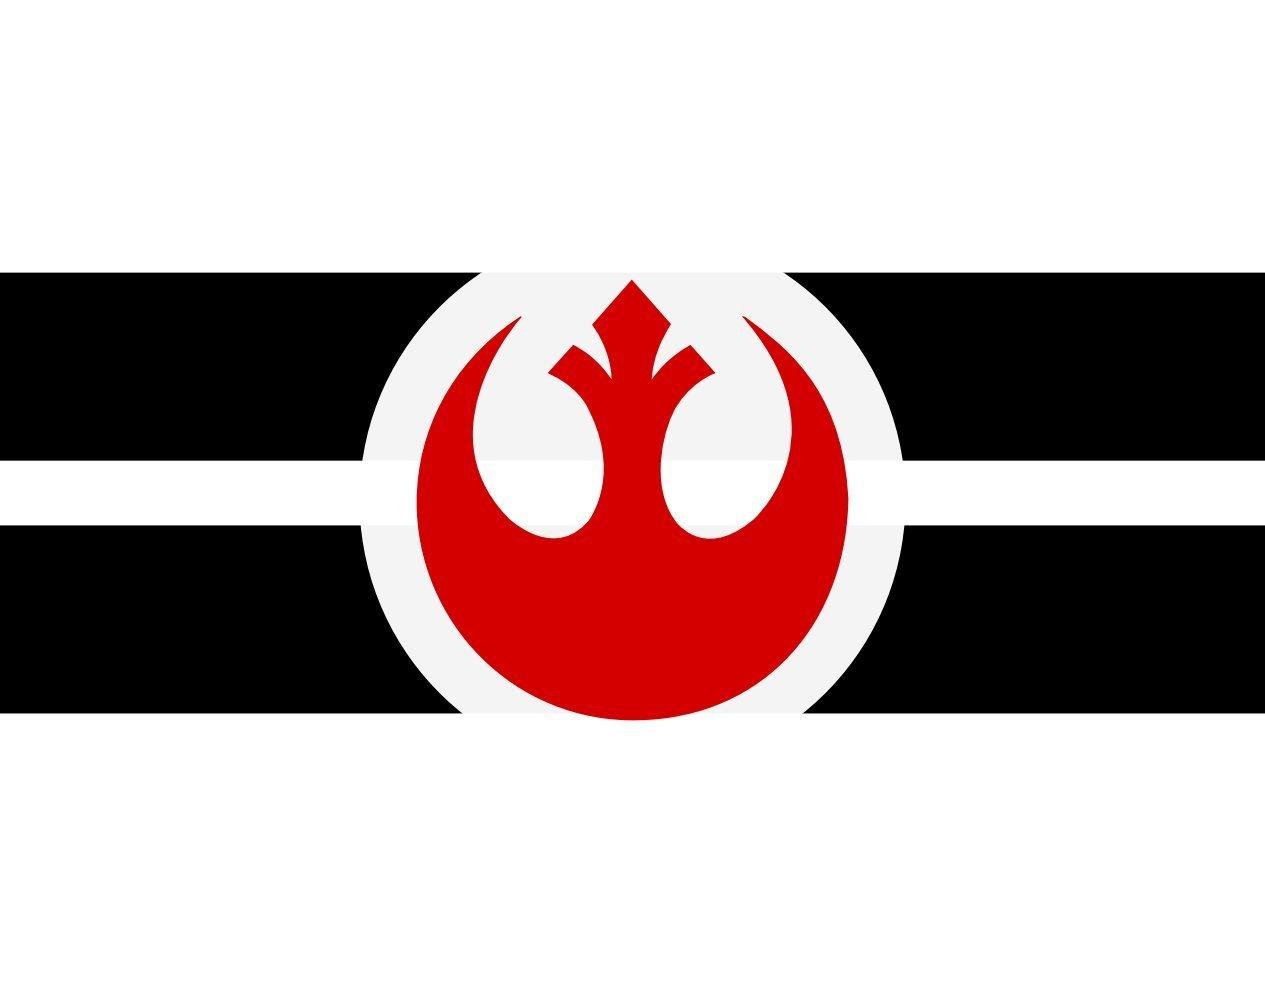 Table-Flag / Desk-Flag: Alliance to Restore the Republic a 15x25cm